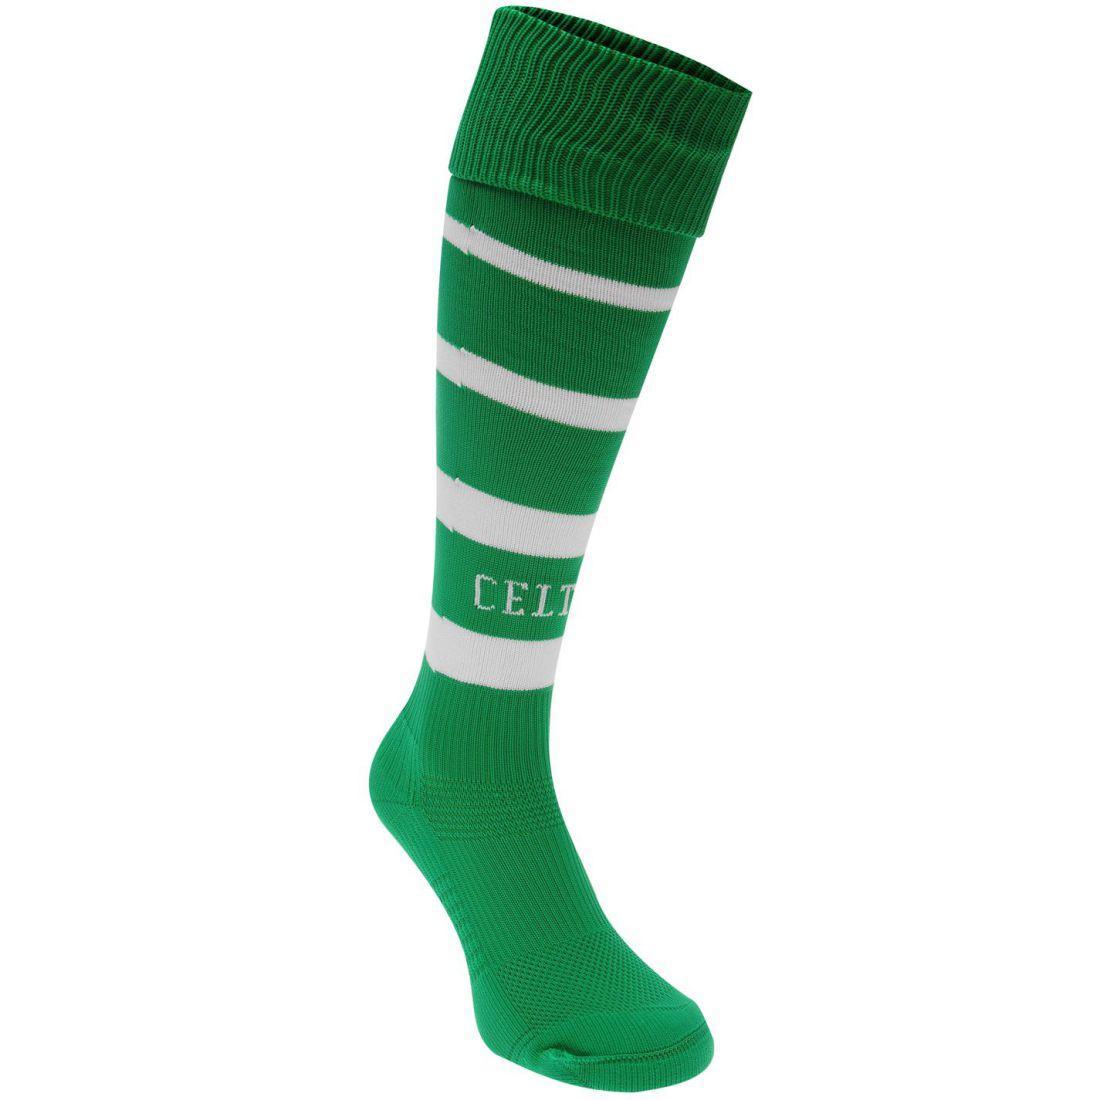 94c325f6 Details about New Balance Kids Boys Celtic Home Socks 2018 2019 Domestic  Football